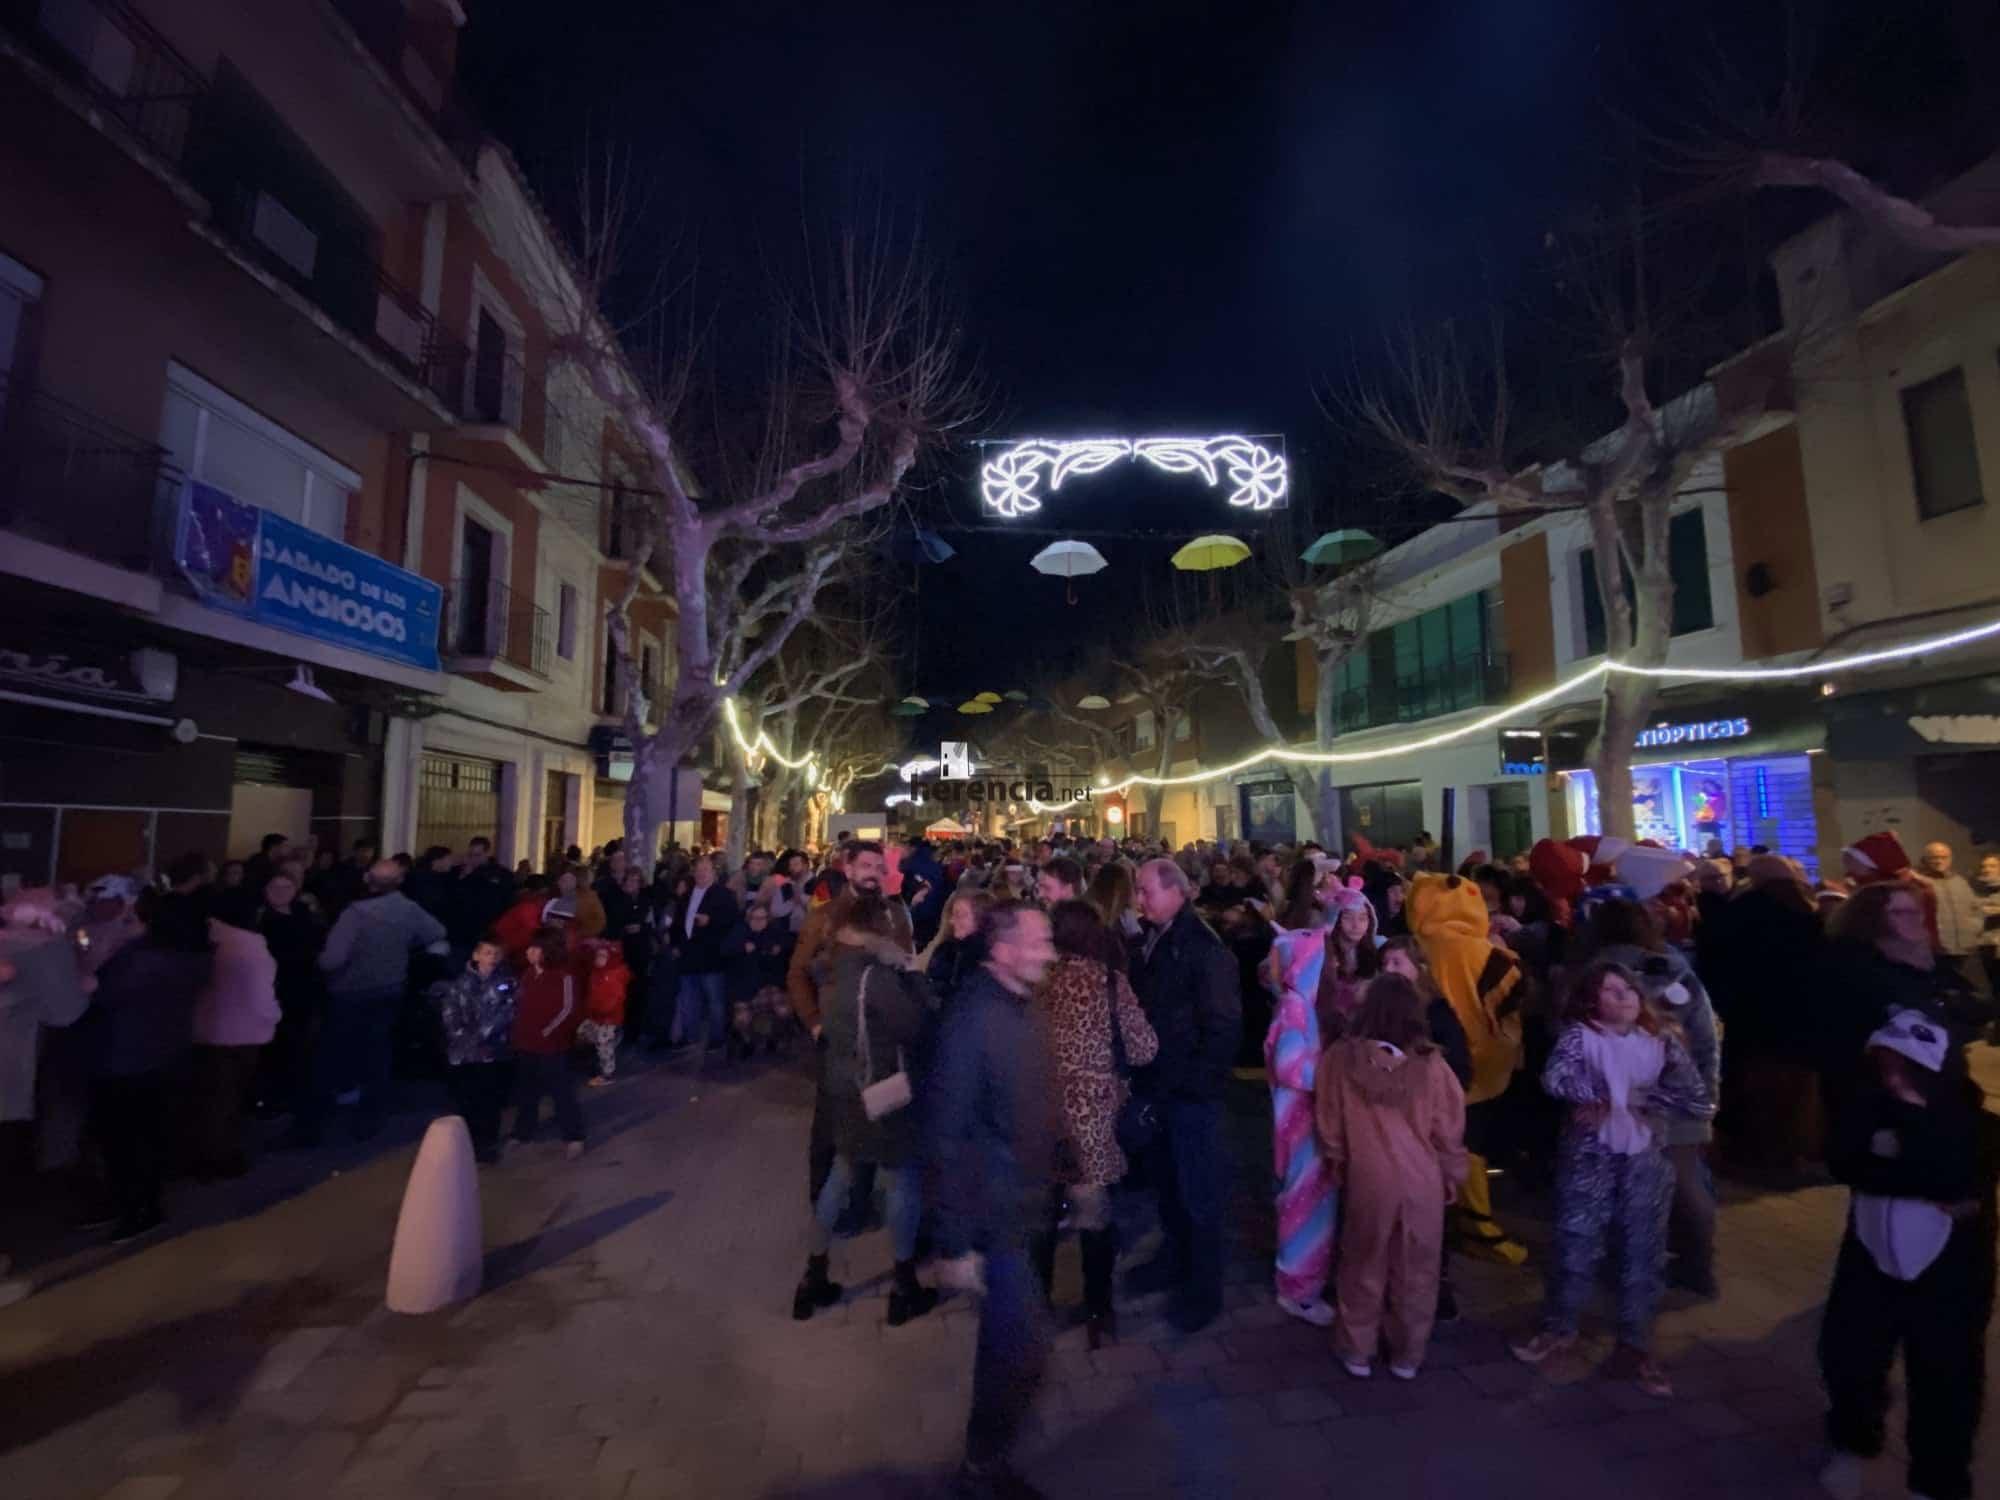 Carnaval de herencia 2019 sabados ansiosos 3 - Inaugurado el Carnaval de Herencia 2020 con el Sábado de los Ansiosos